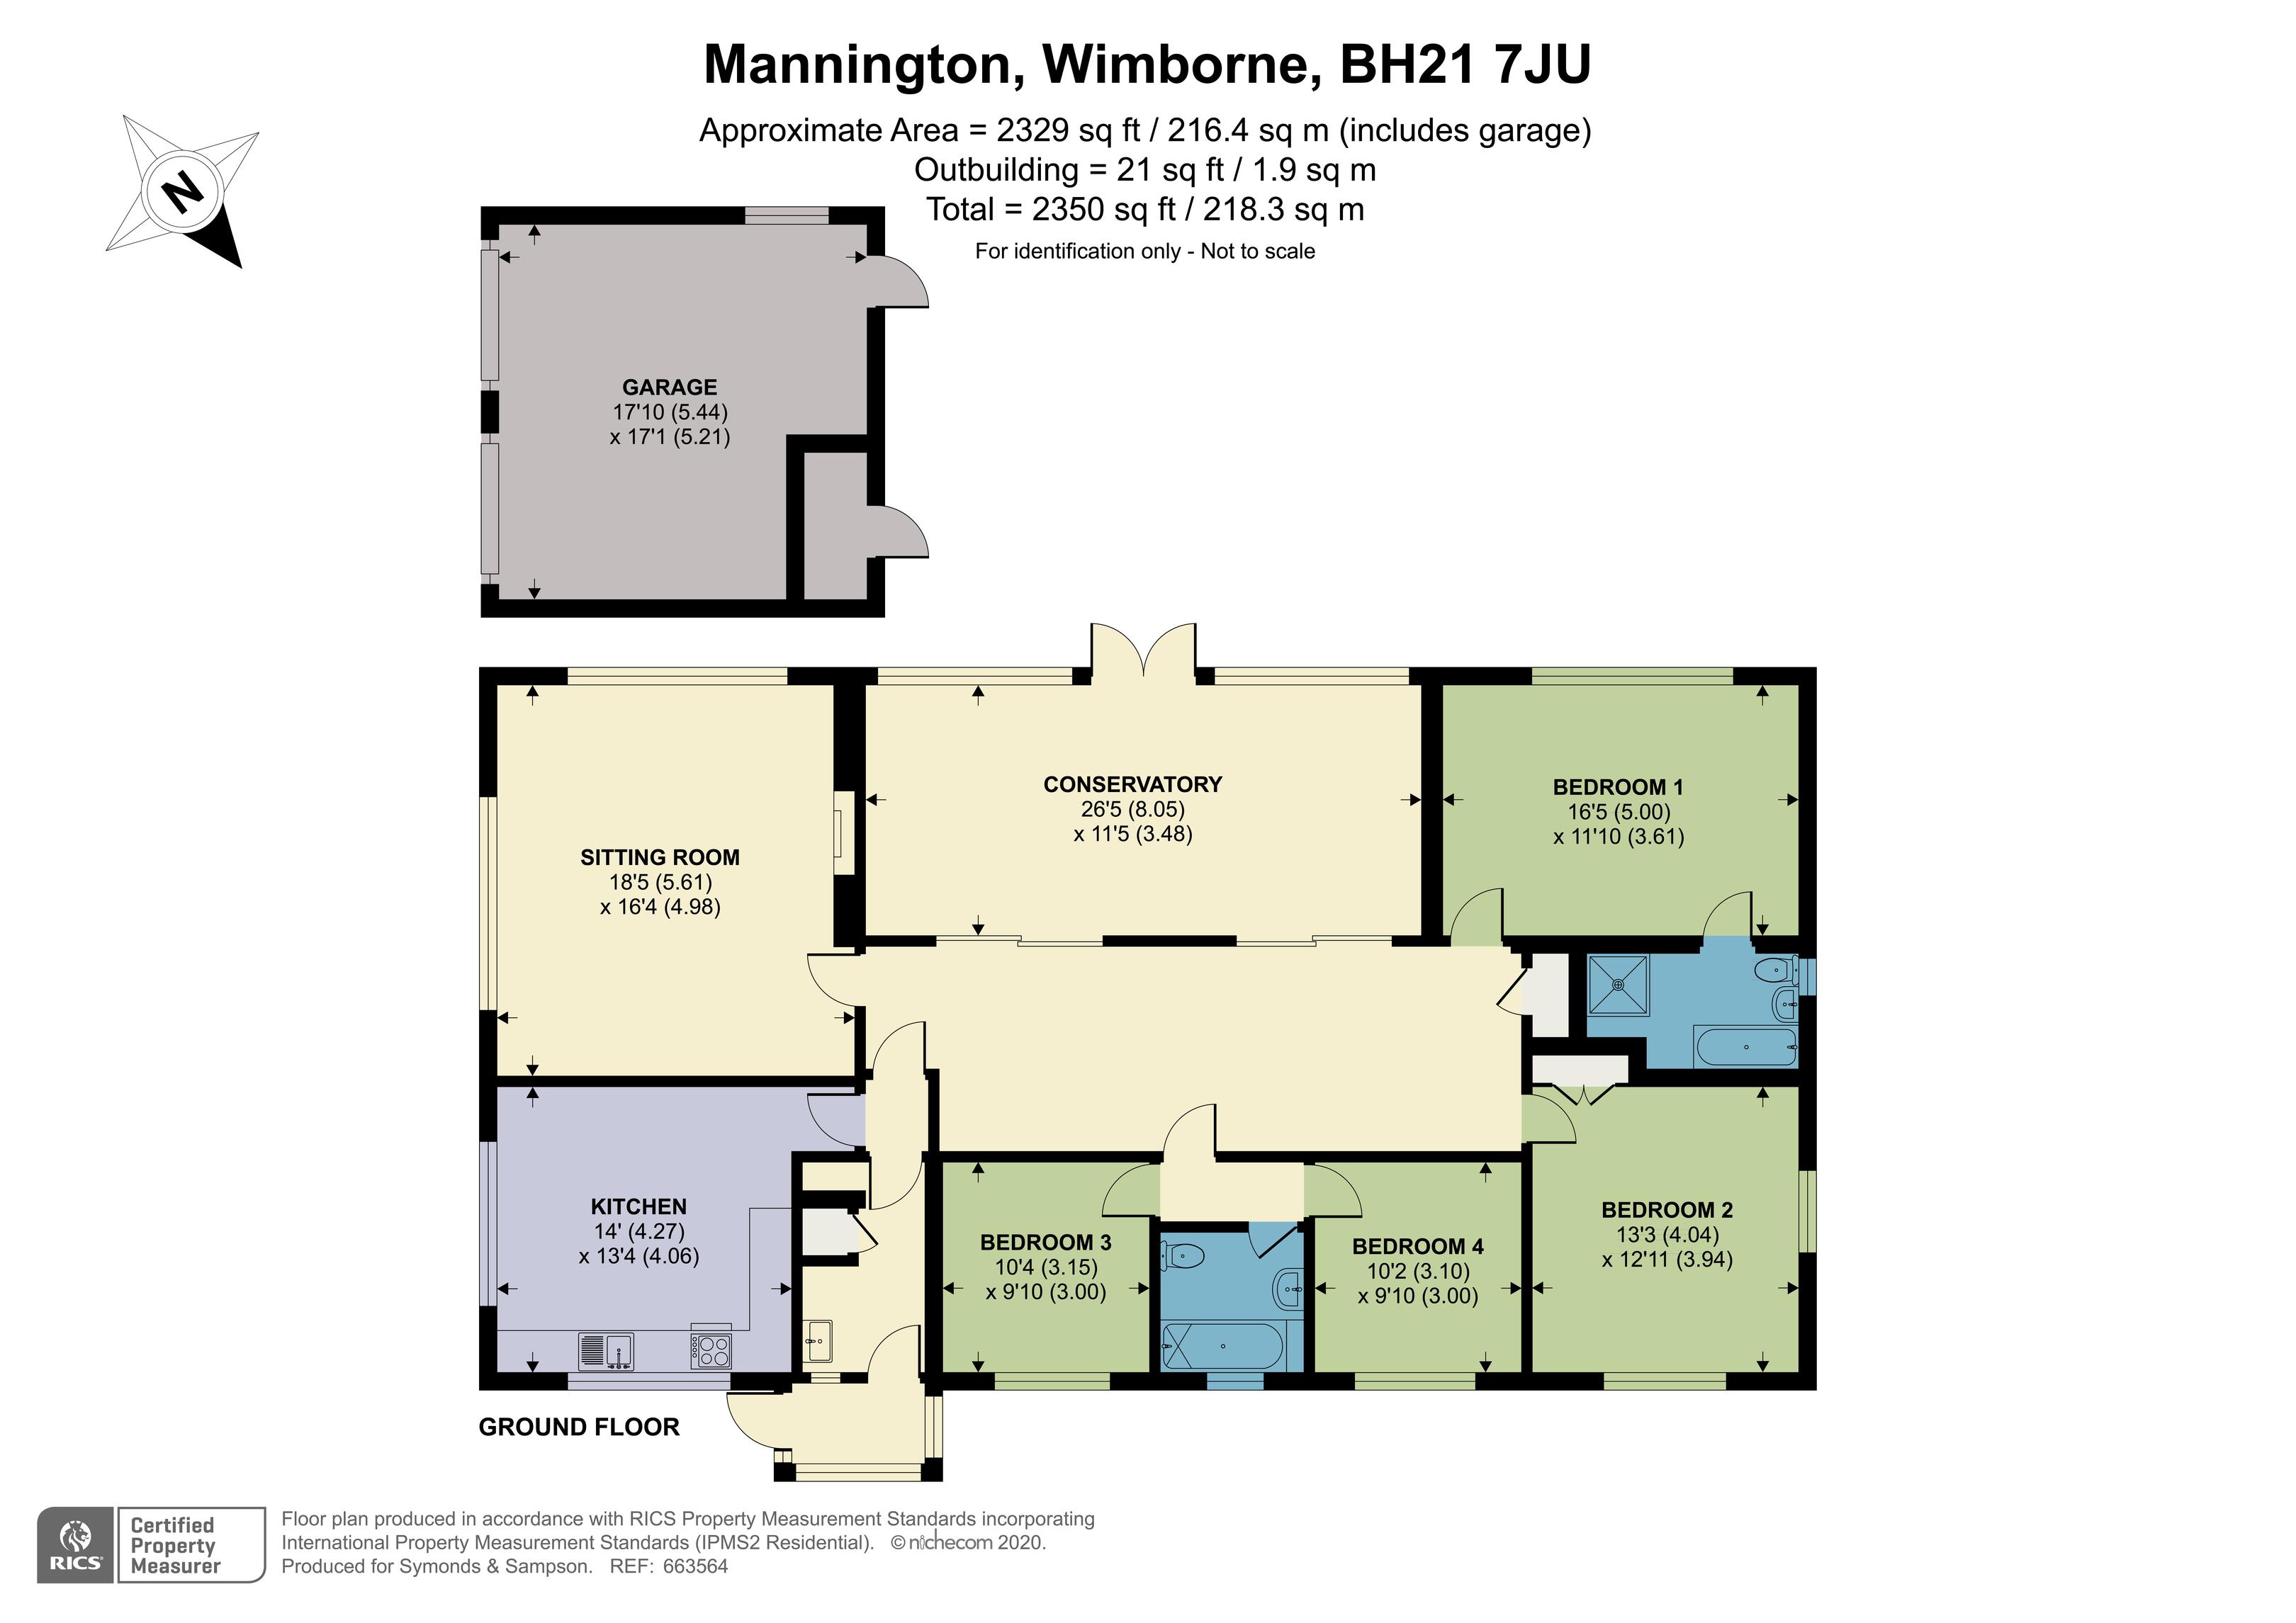 Floorplan - Brooklands Farm, Mannington, Wimborne, BH21 7JU